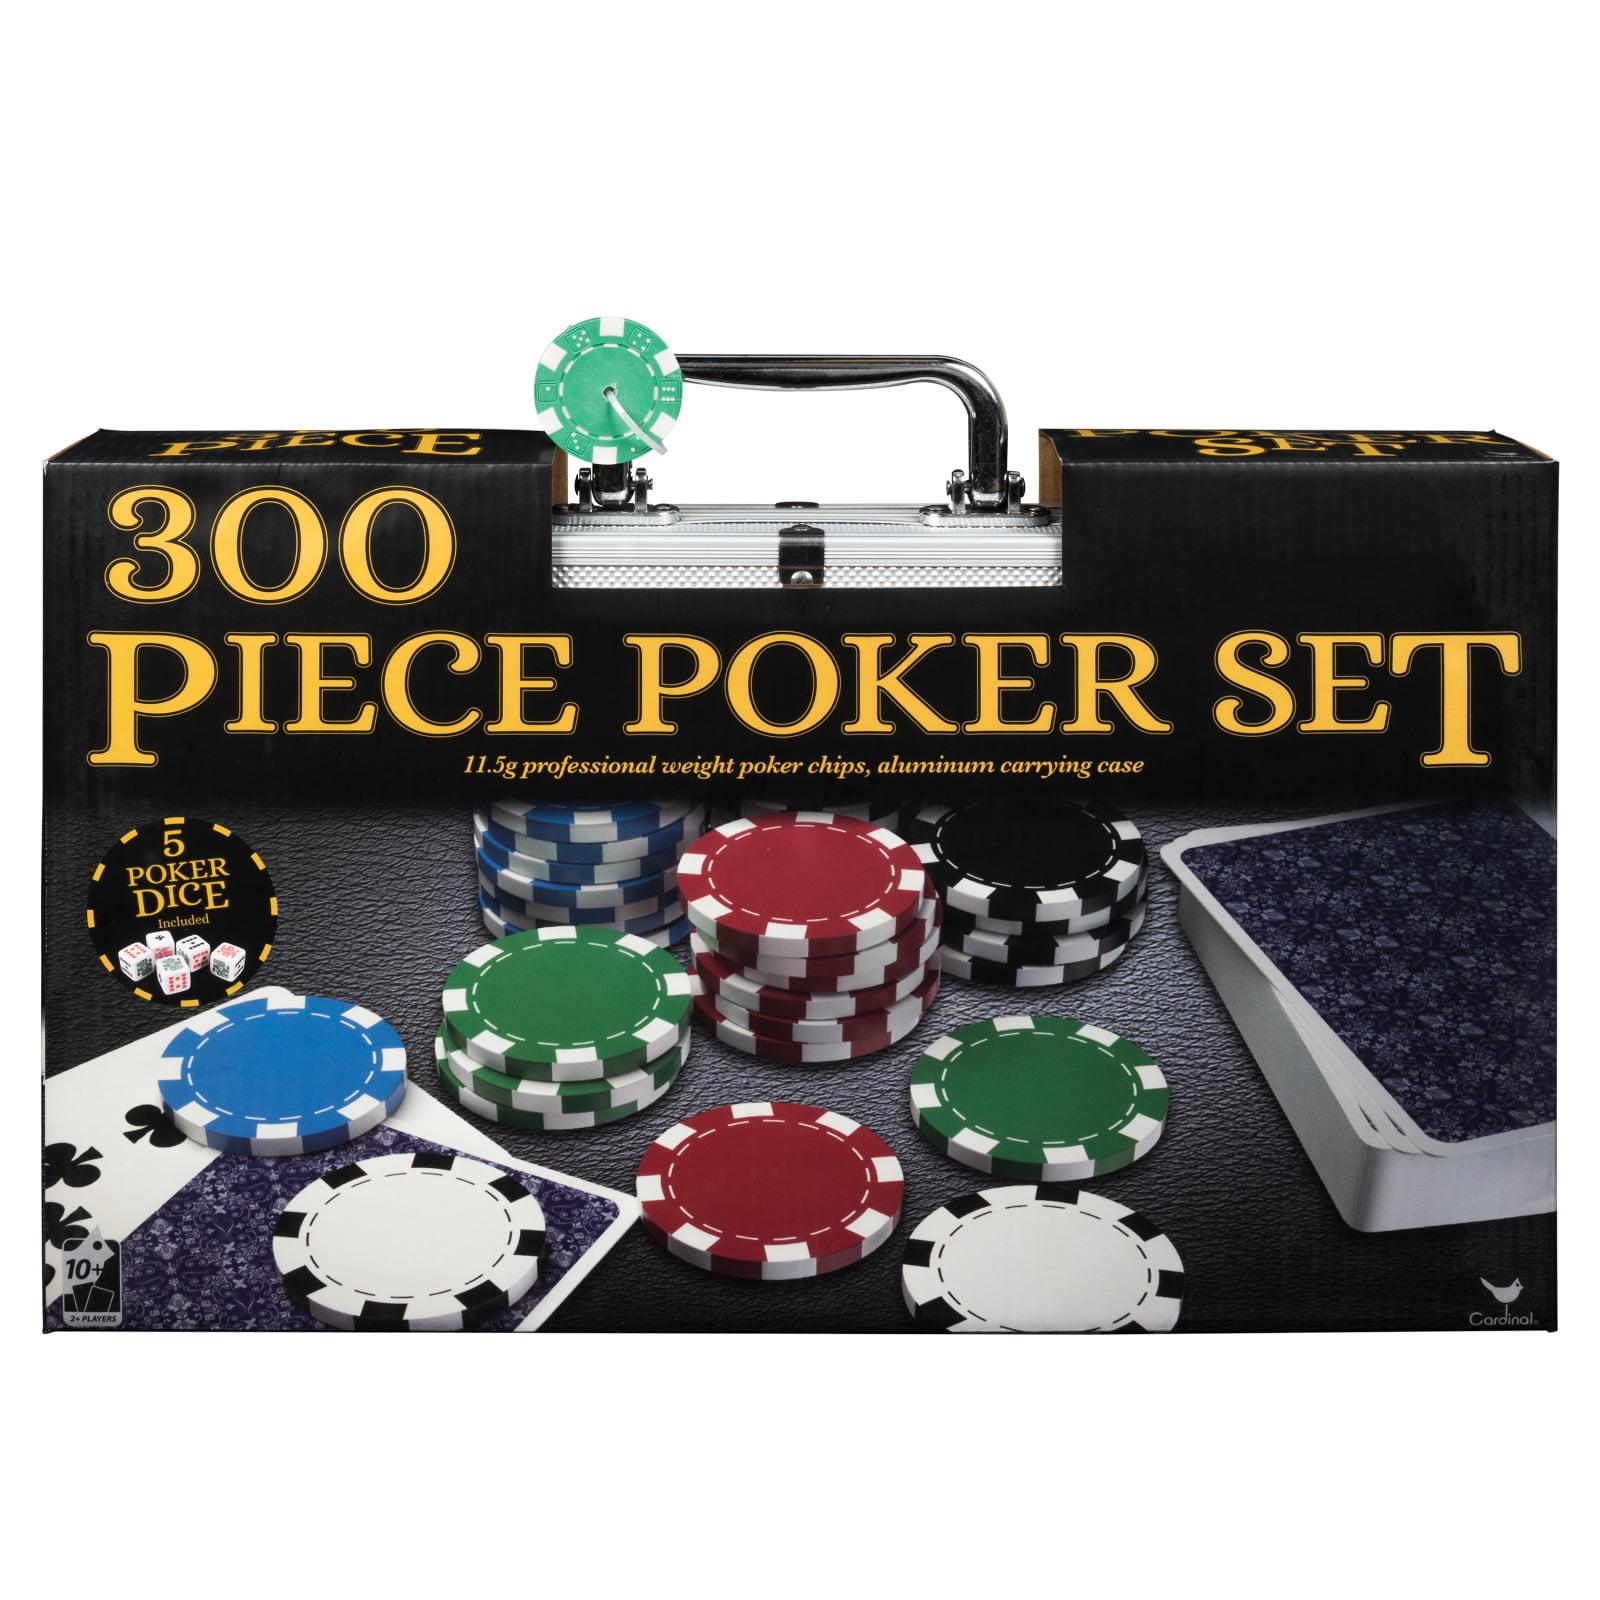 Professional 300-Piece Poker Set in Aluminum Carry Case